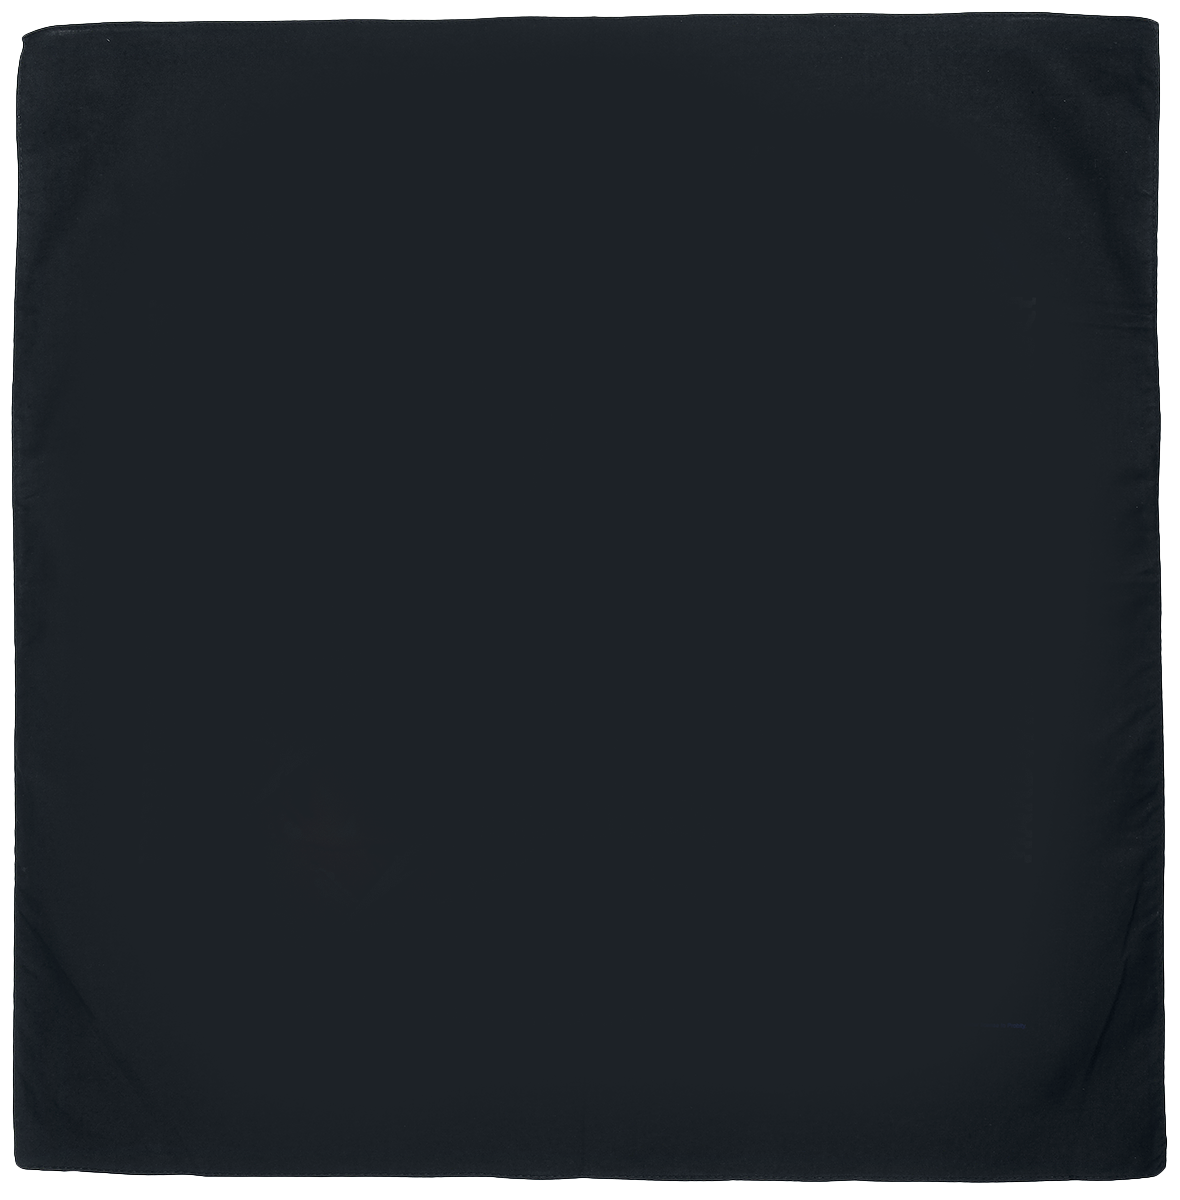 Rock Daddy - Black Bandana - Bandana - schwarz